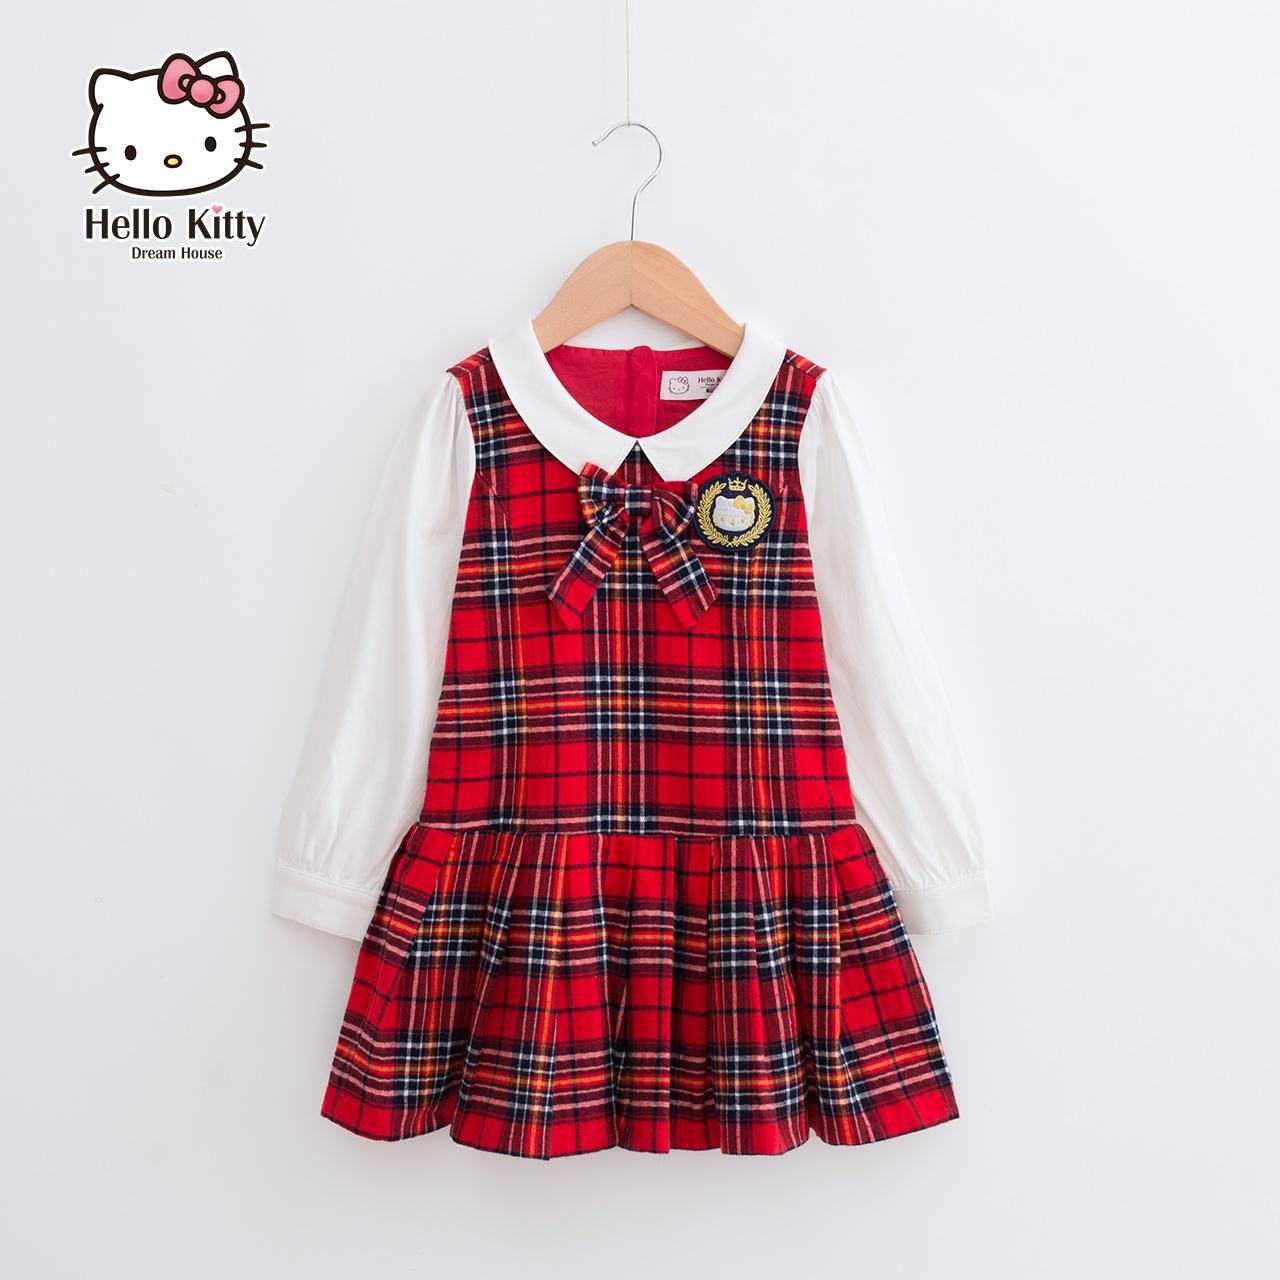 HelloKitty童装2018新款秋装公主宝宝女童连衣裙儿童小女孩格子裙